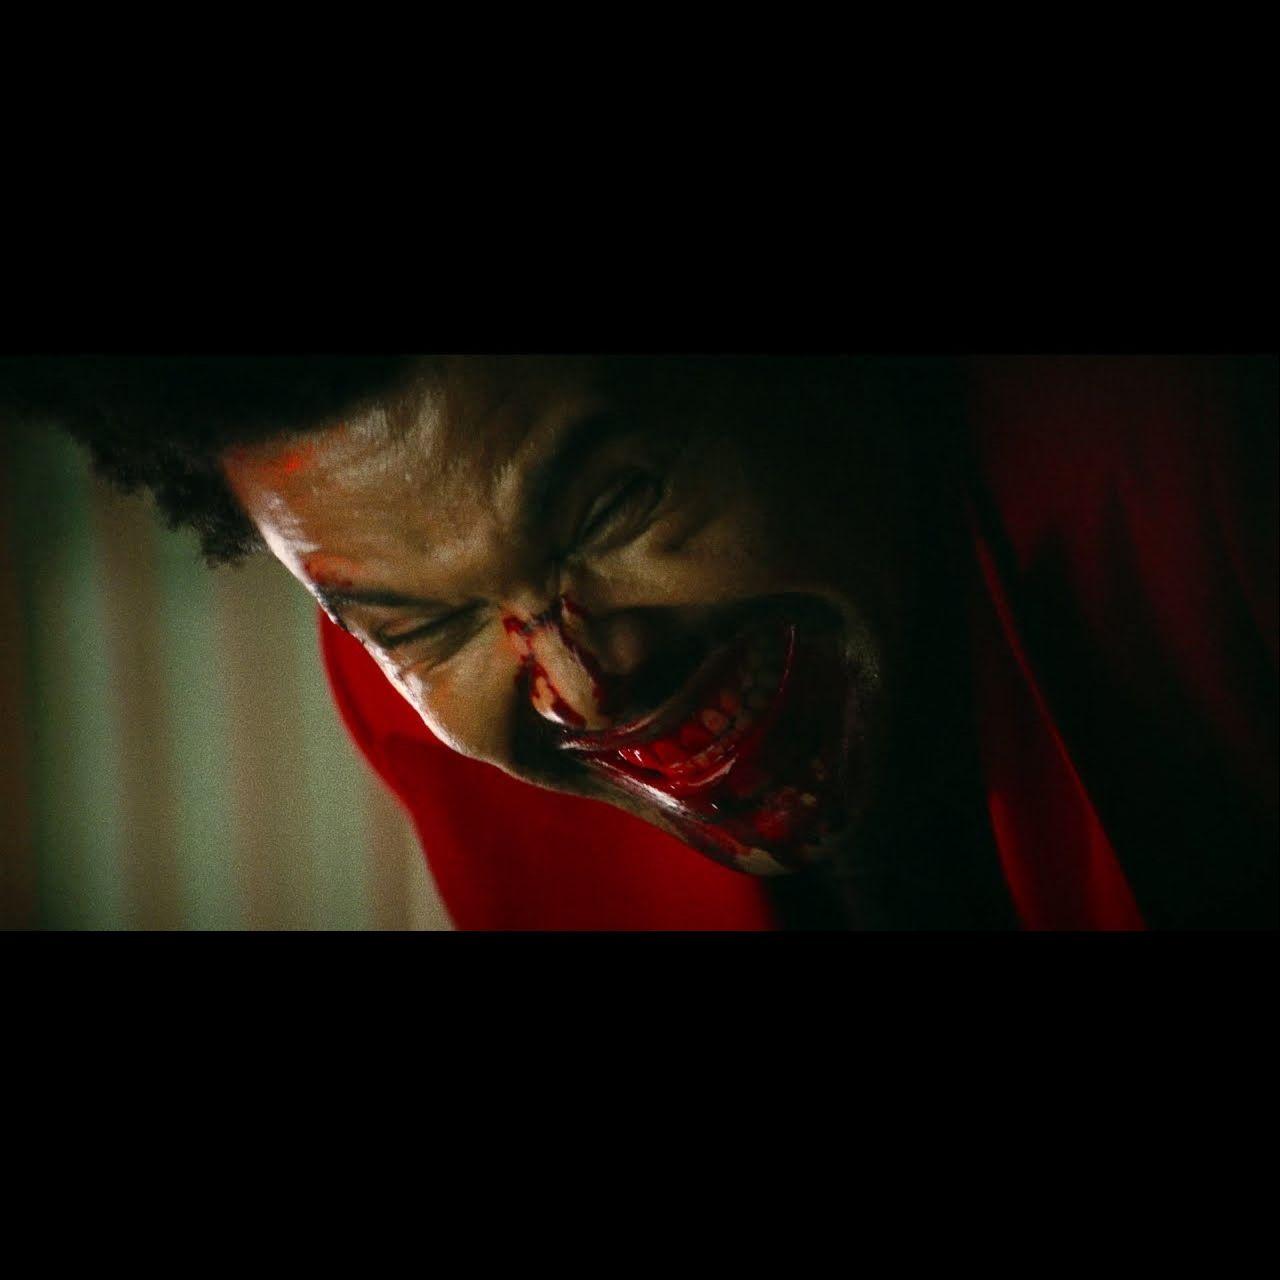 The Weeknd - Blinding Lights (Thumbnail)